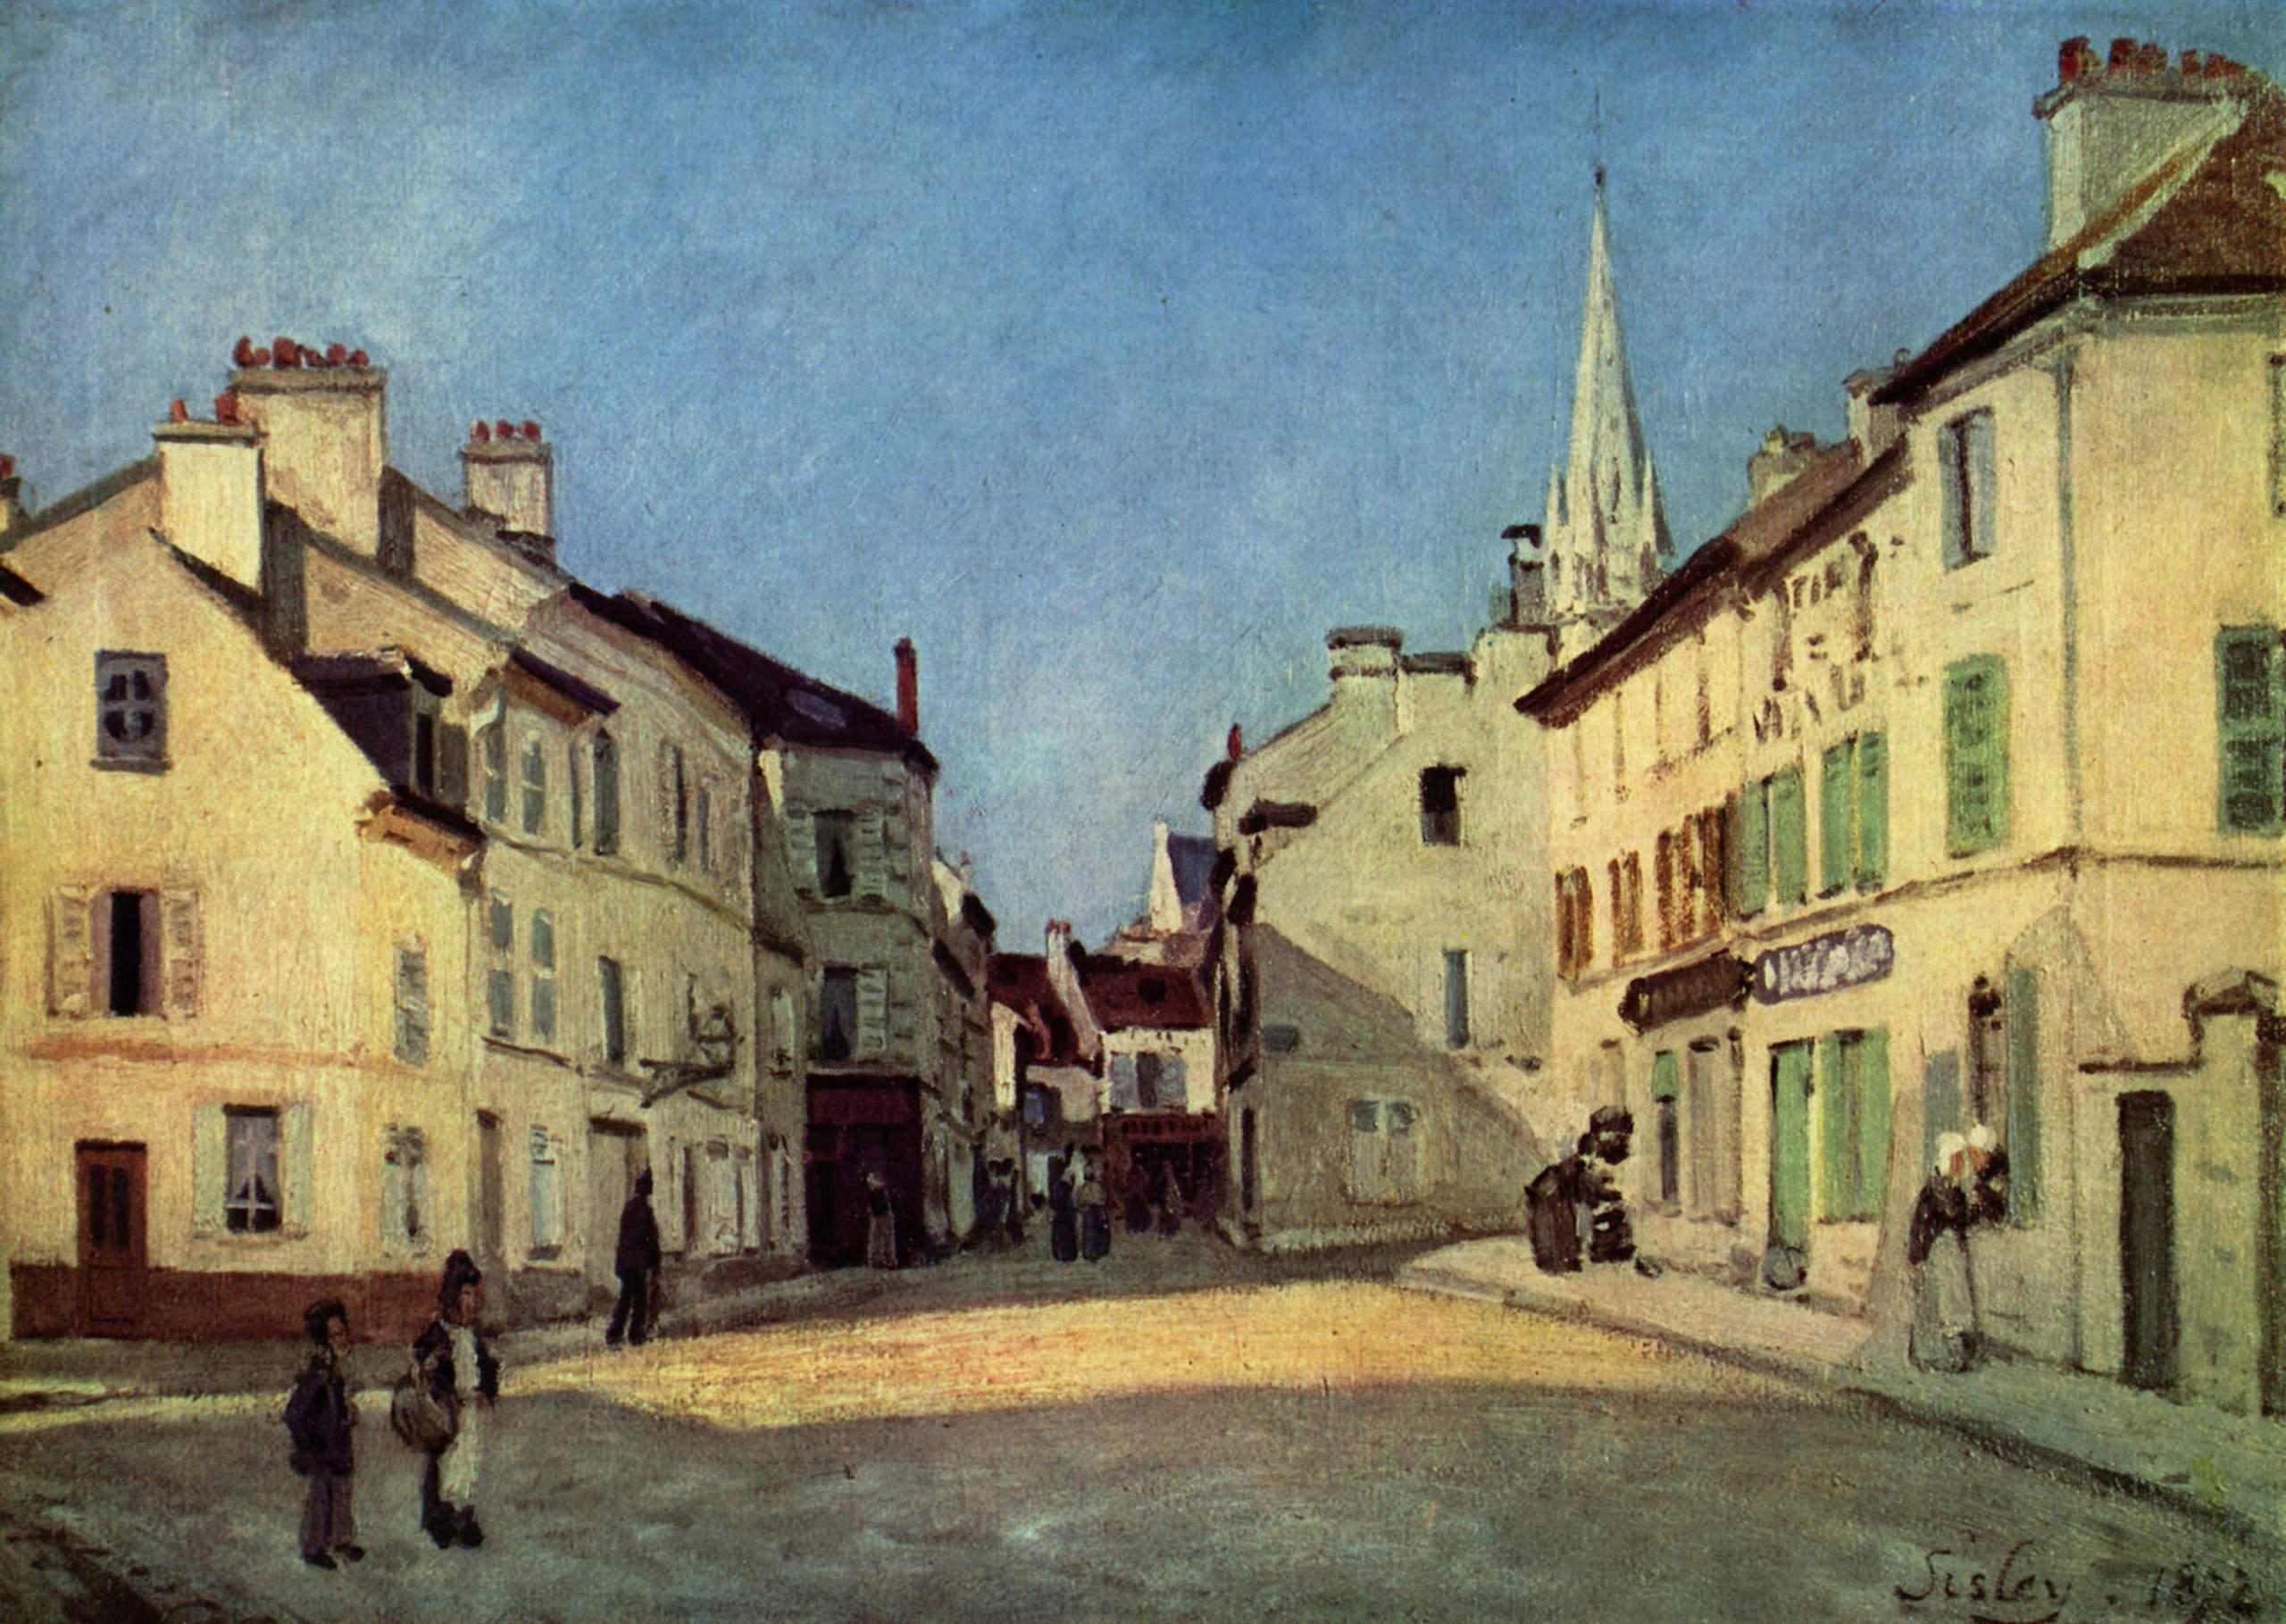 Alfred Sisley, (1839 - 1899) Platz-in-argenteuil-1872